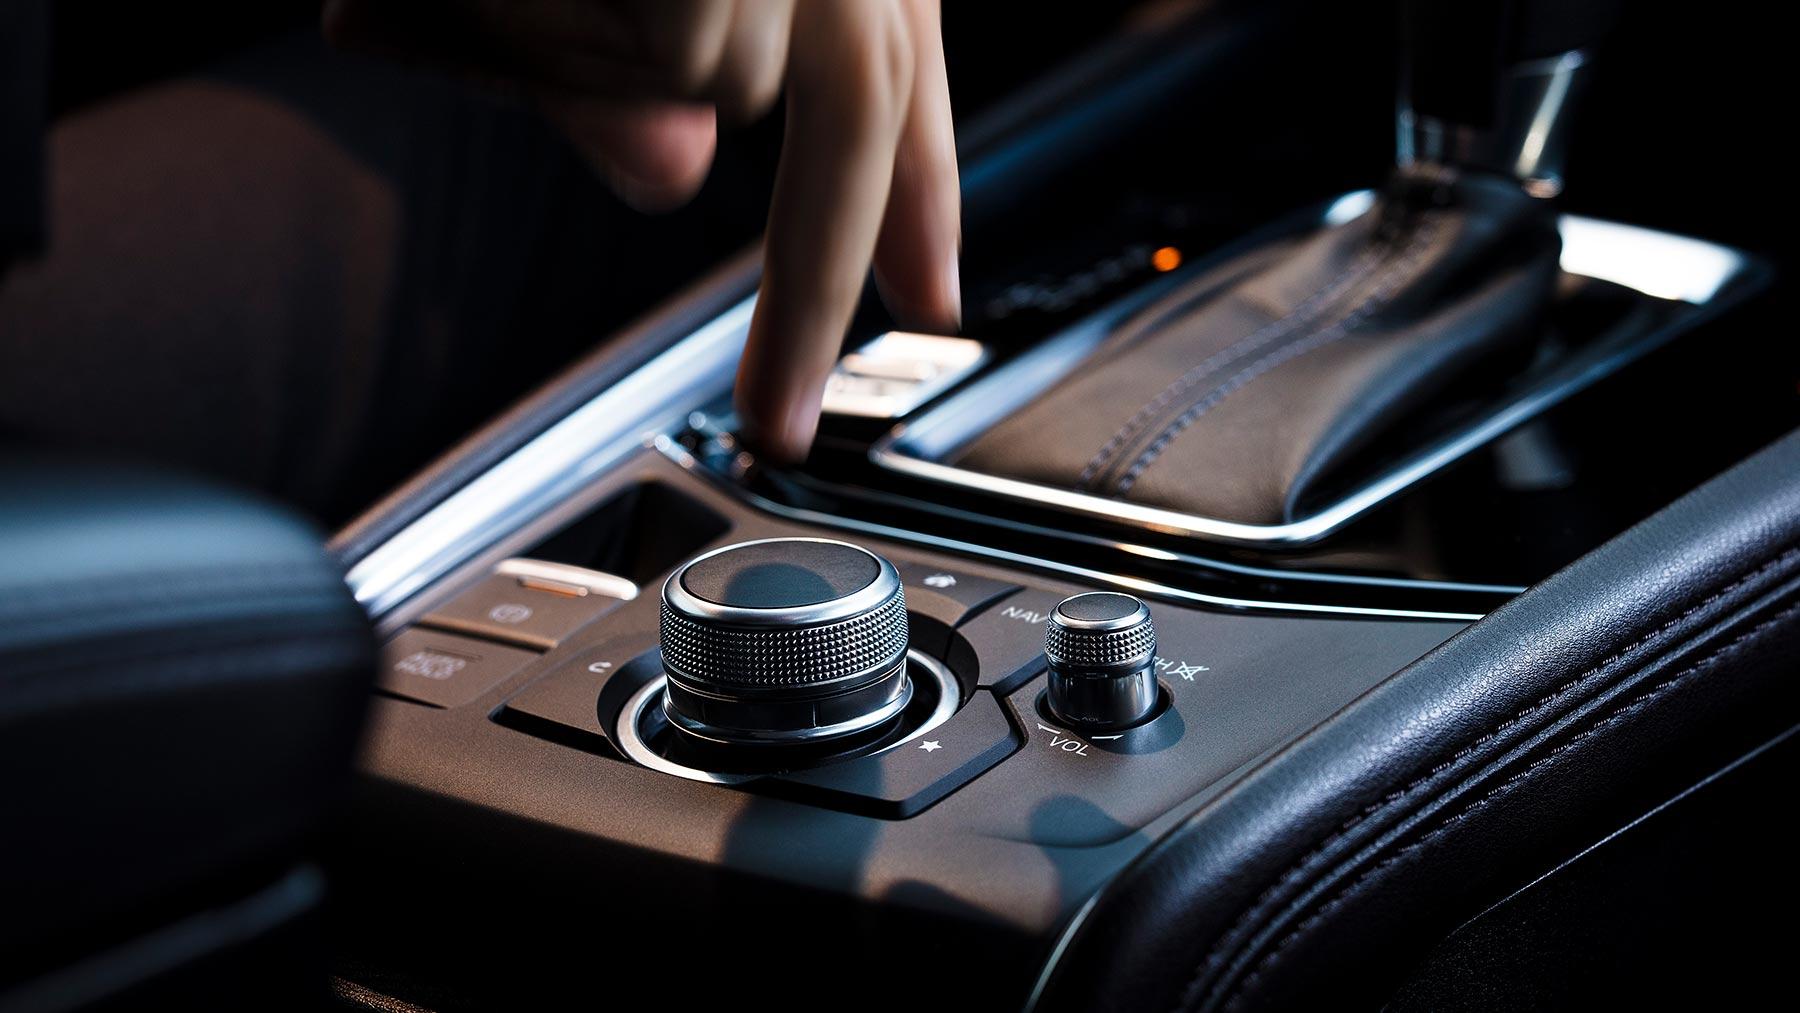 Intuitive Controls in the 2019 Mazda CX-5